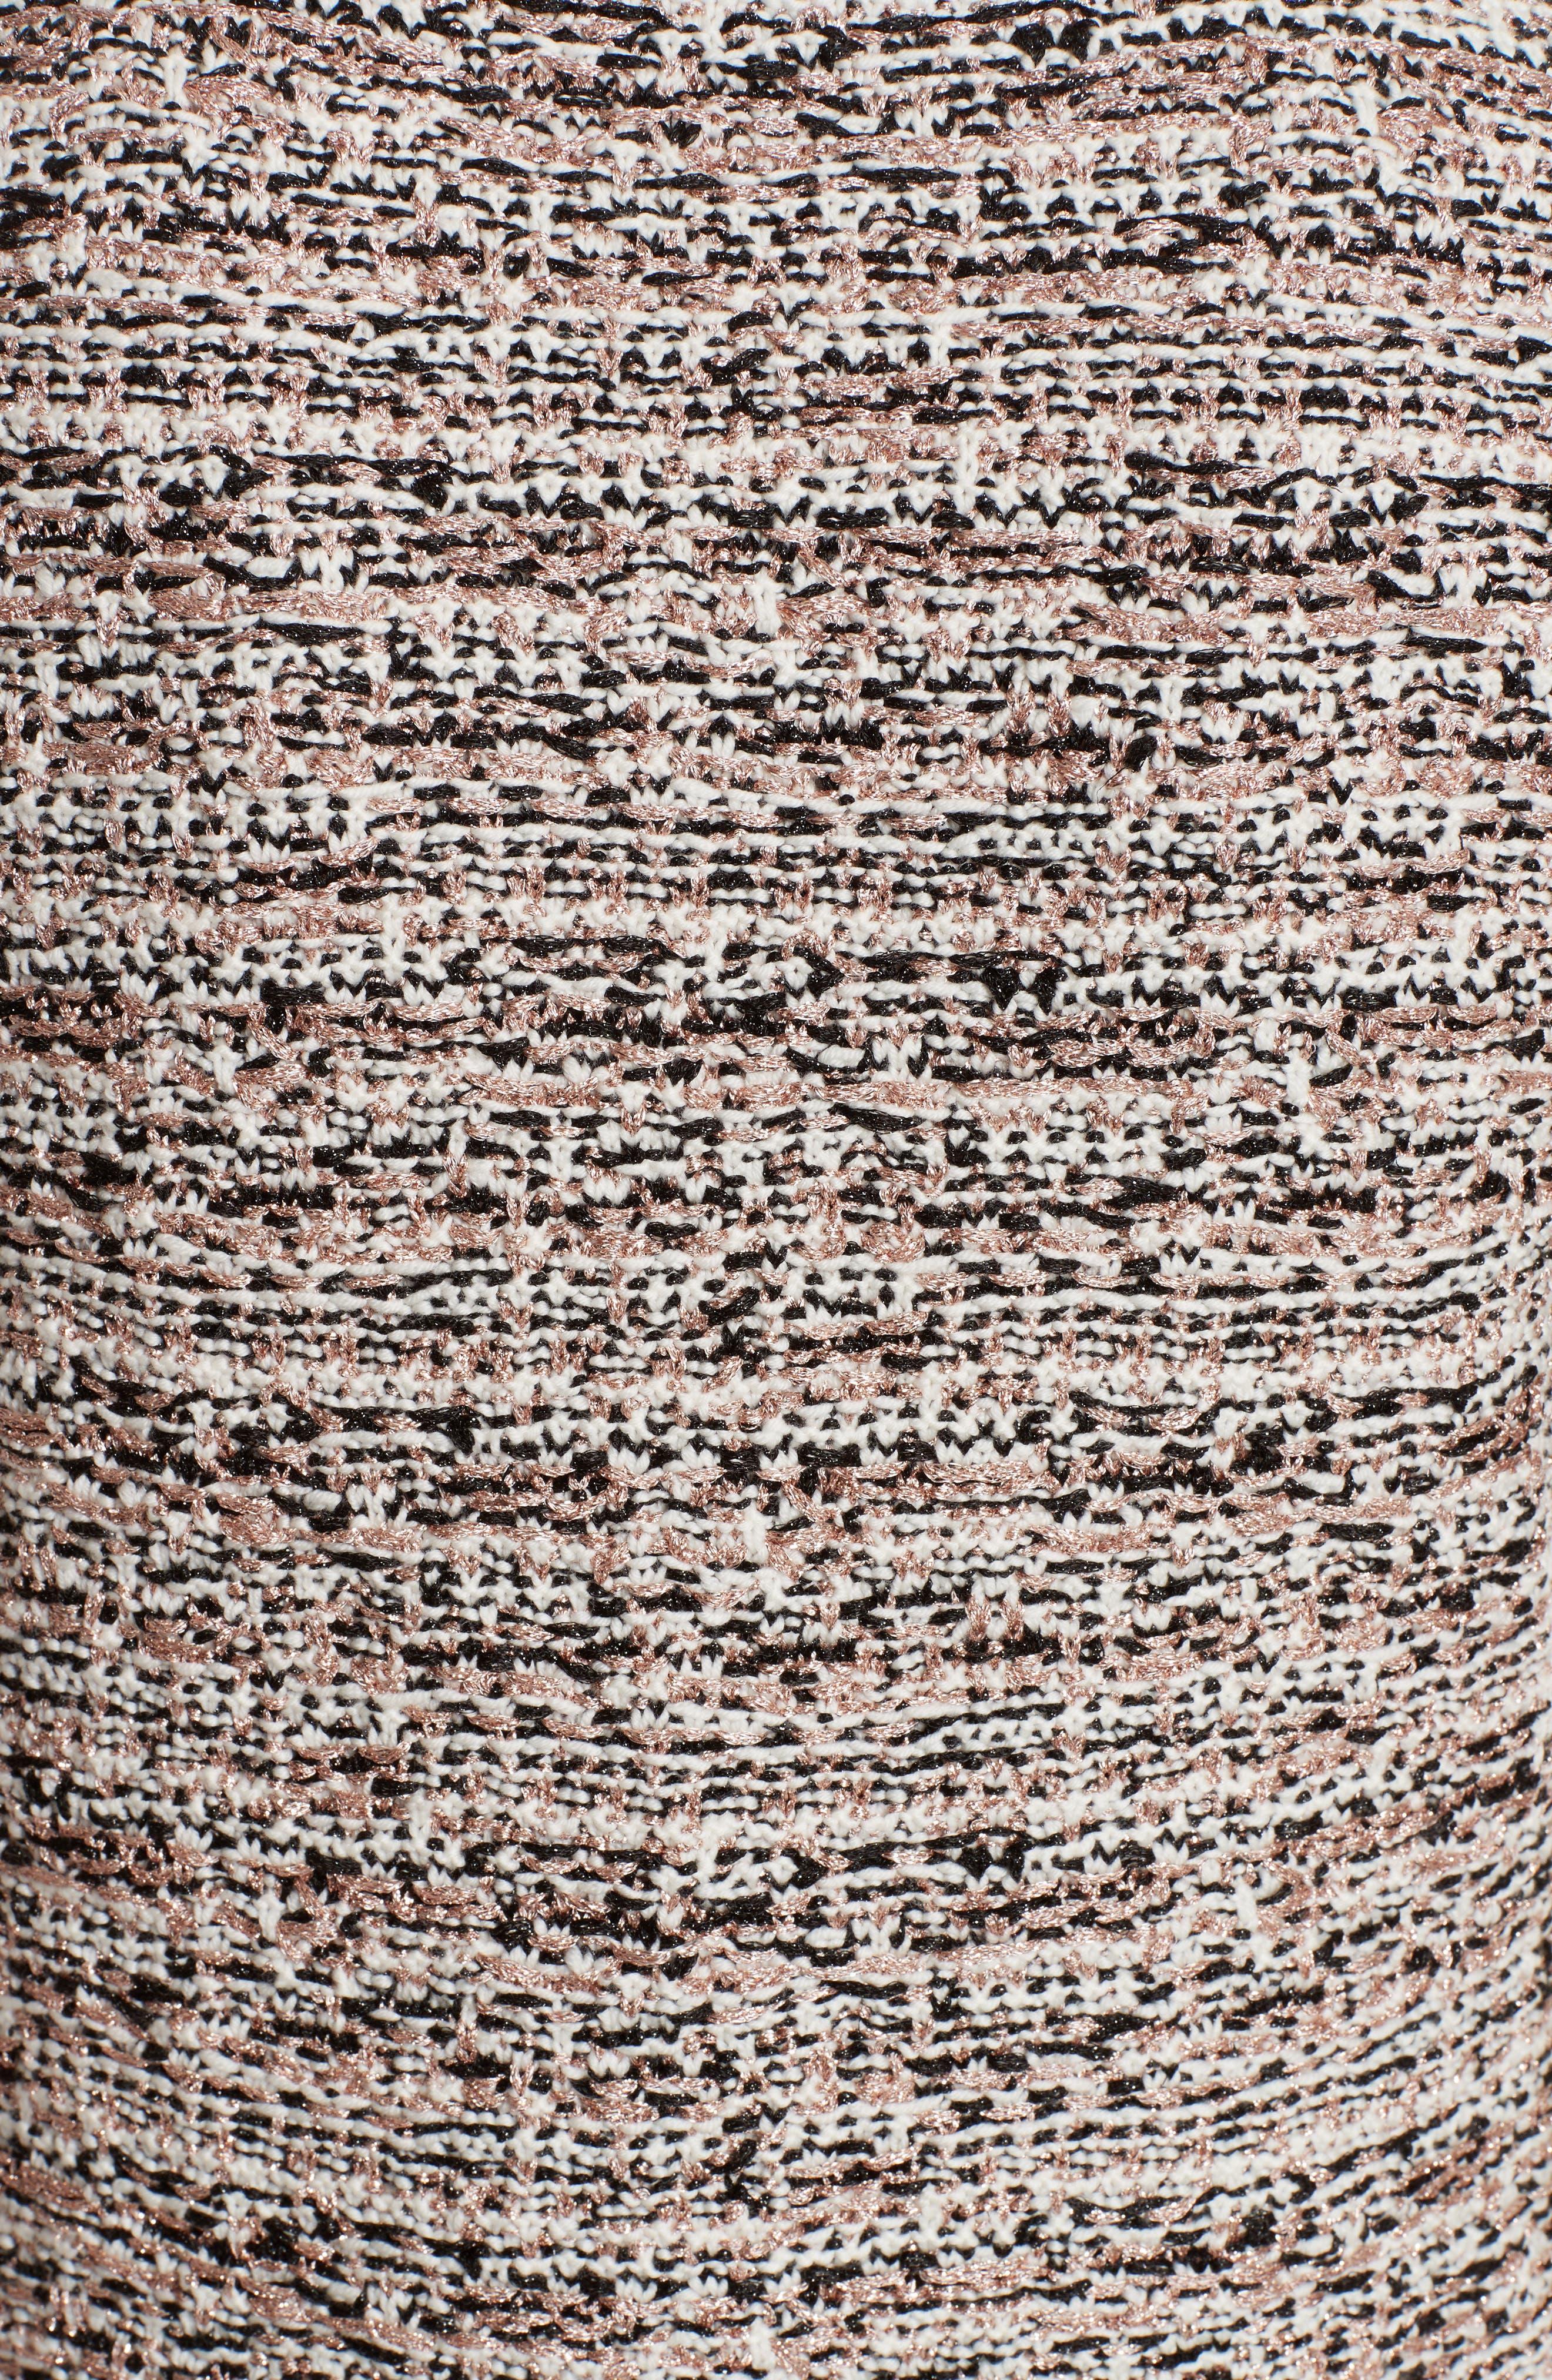 Metallic Tweed Jacket,                             Alternate thumbnail 5, color,                             650